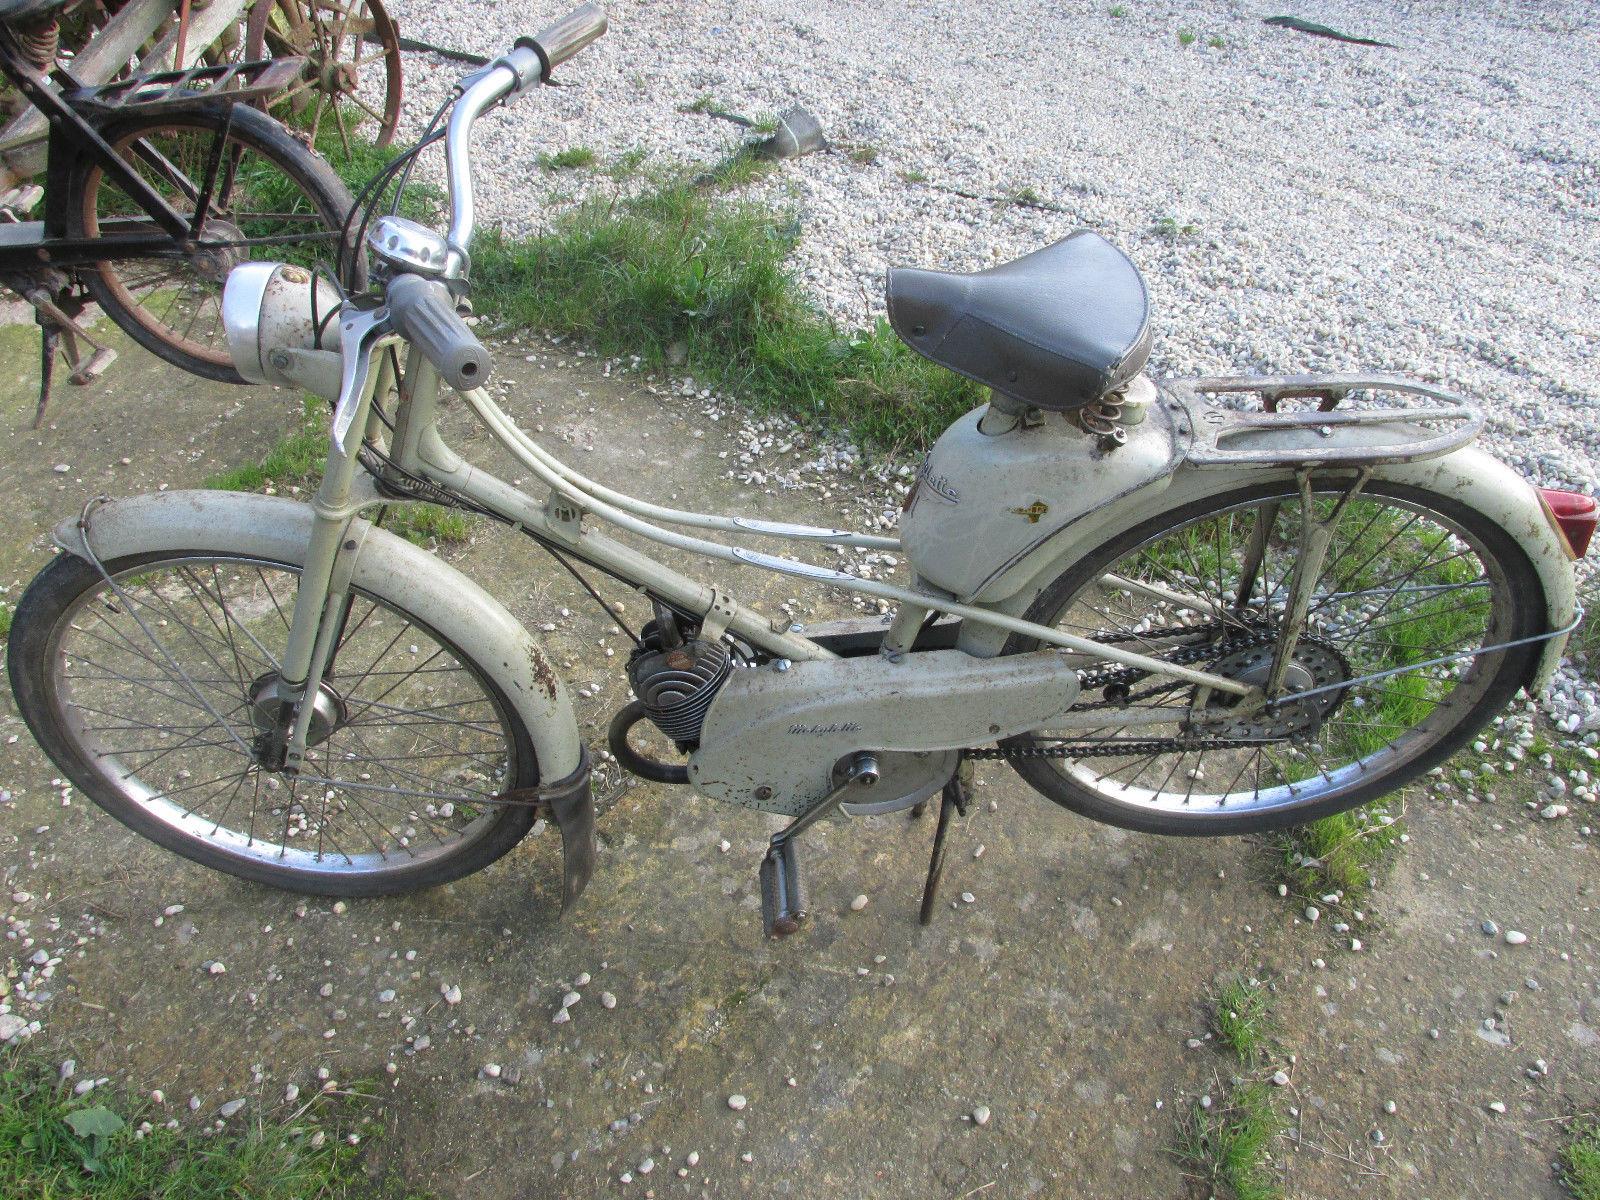 1956 mobylette motobecane av 51 motor caravan french moped classic. Black Bedroom Furniture Sets. Home Design Ideas